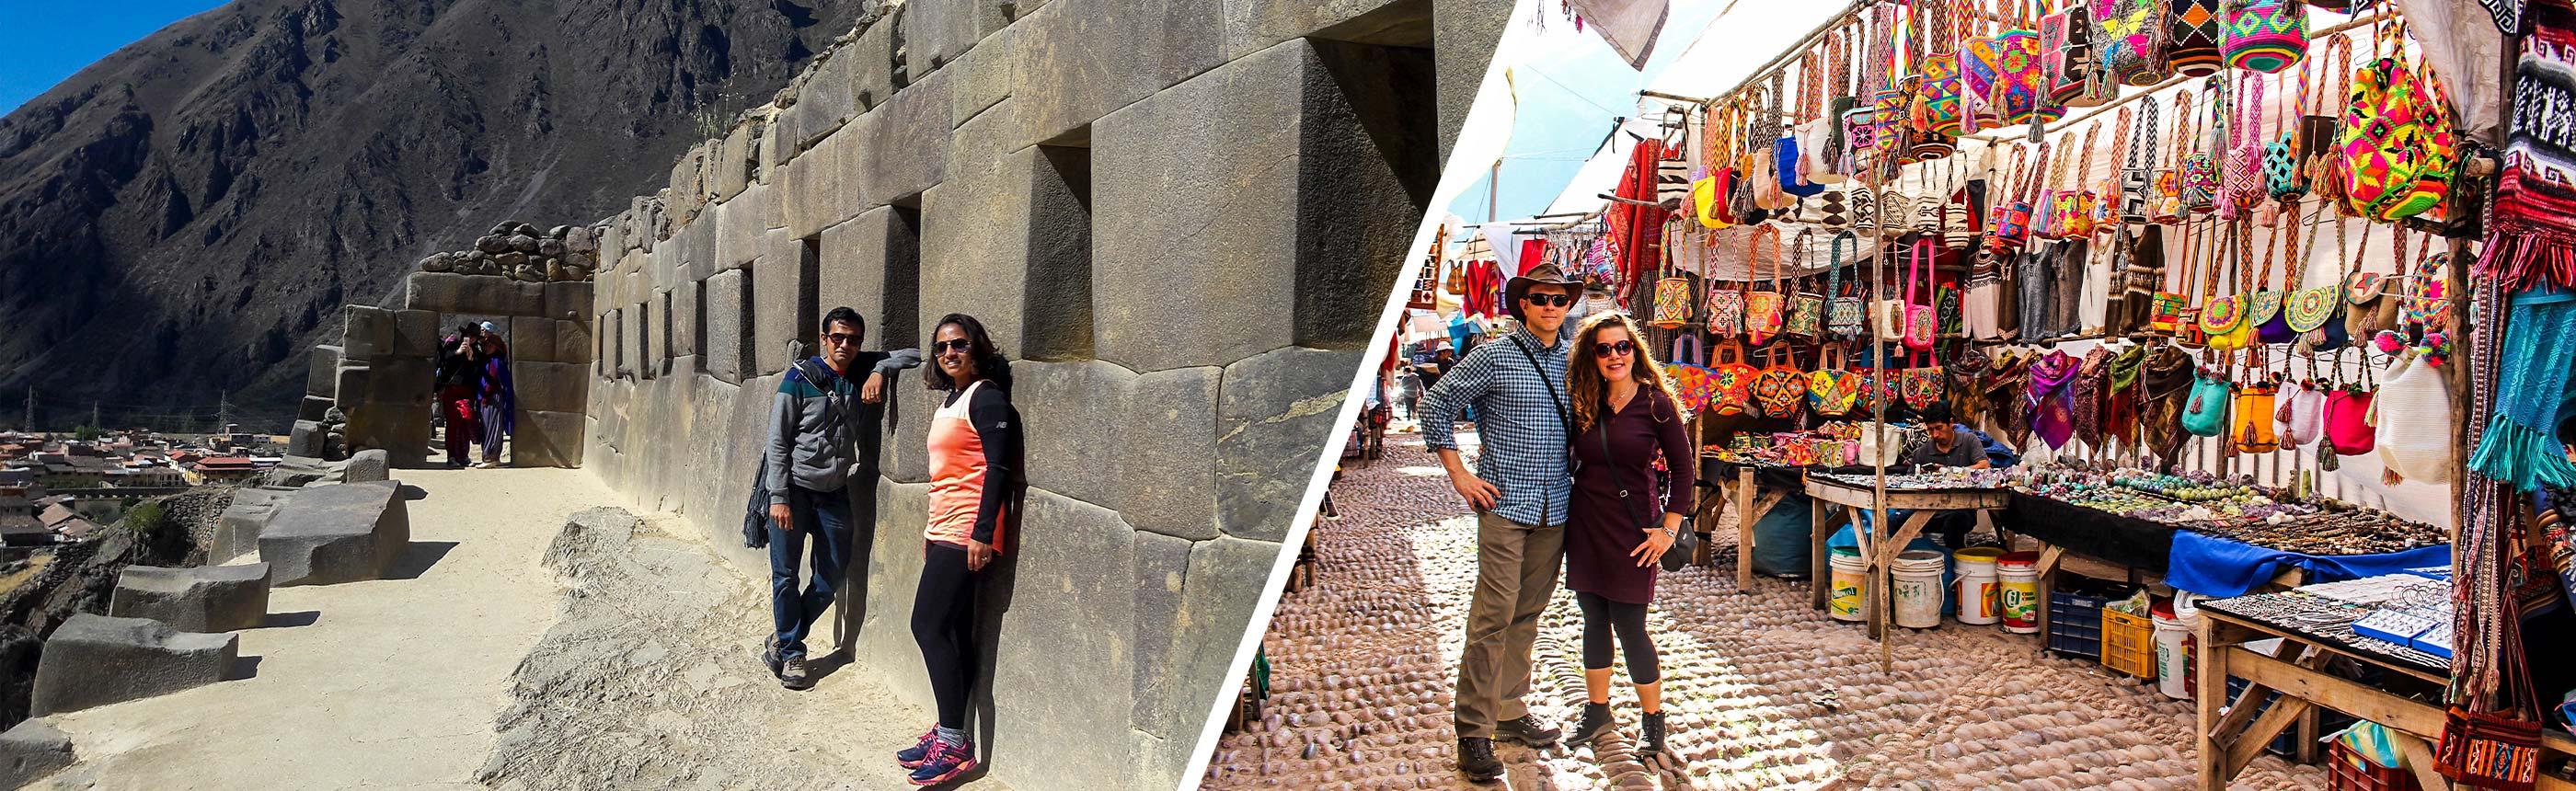 Tour to Sacred Valley & Machu Picchu